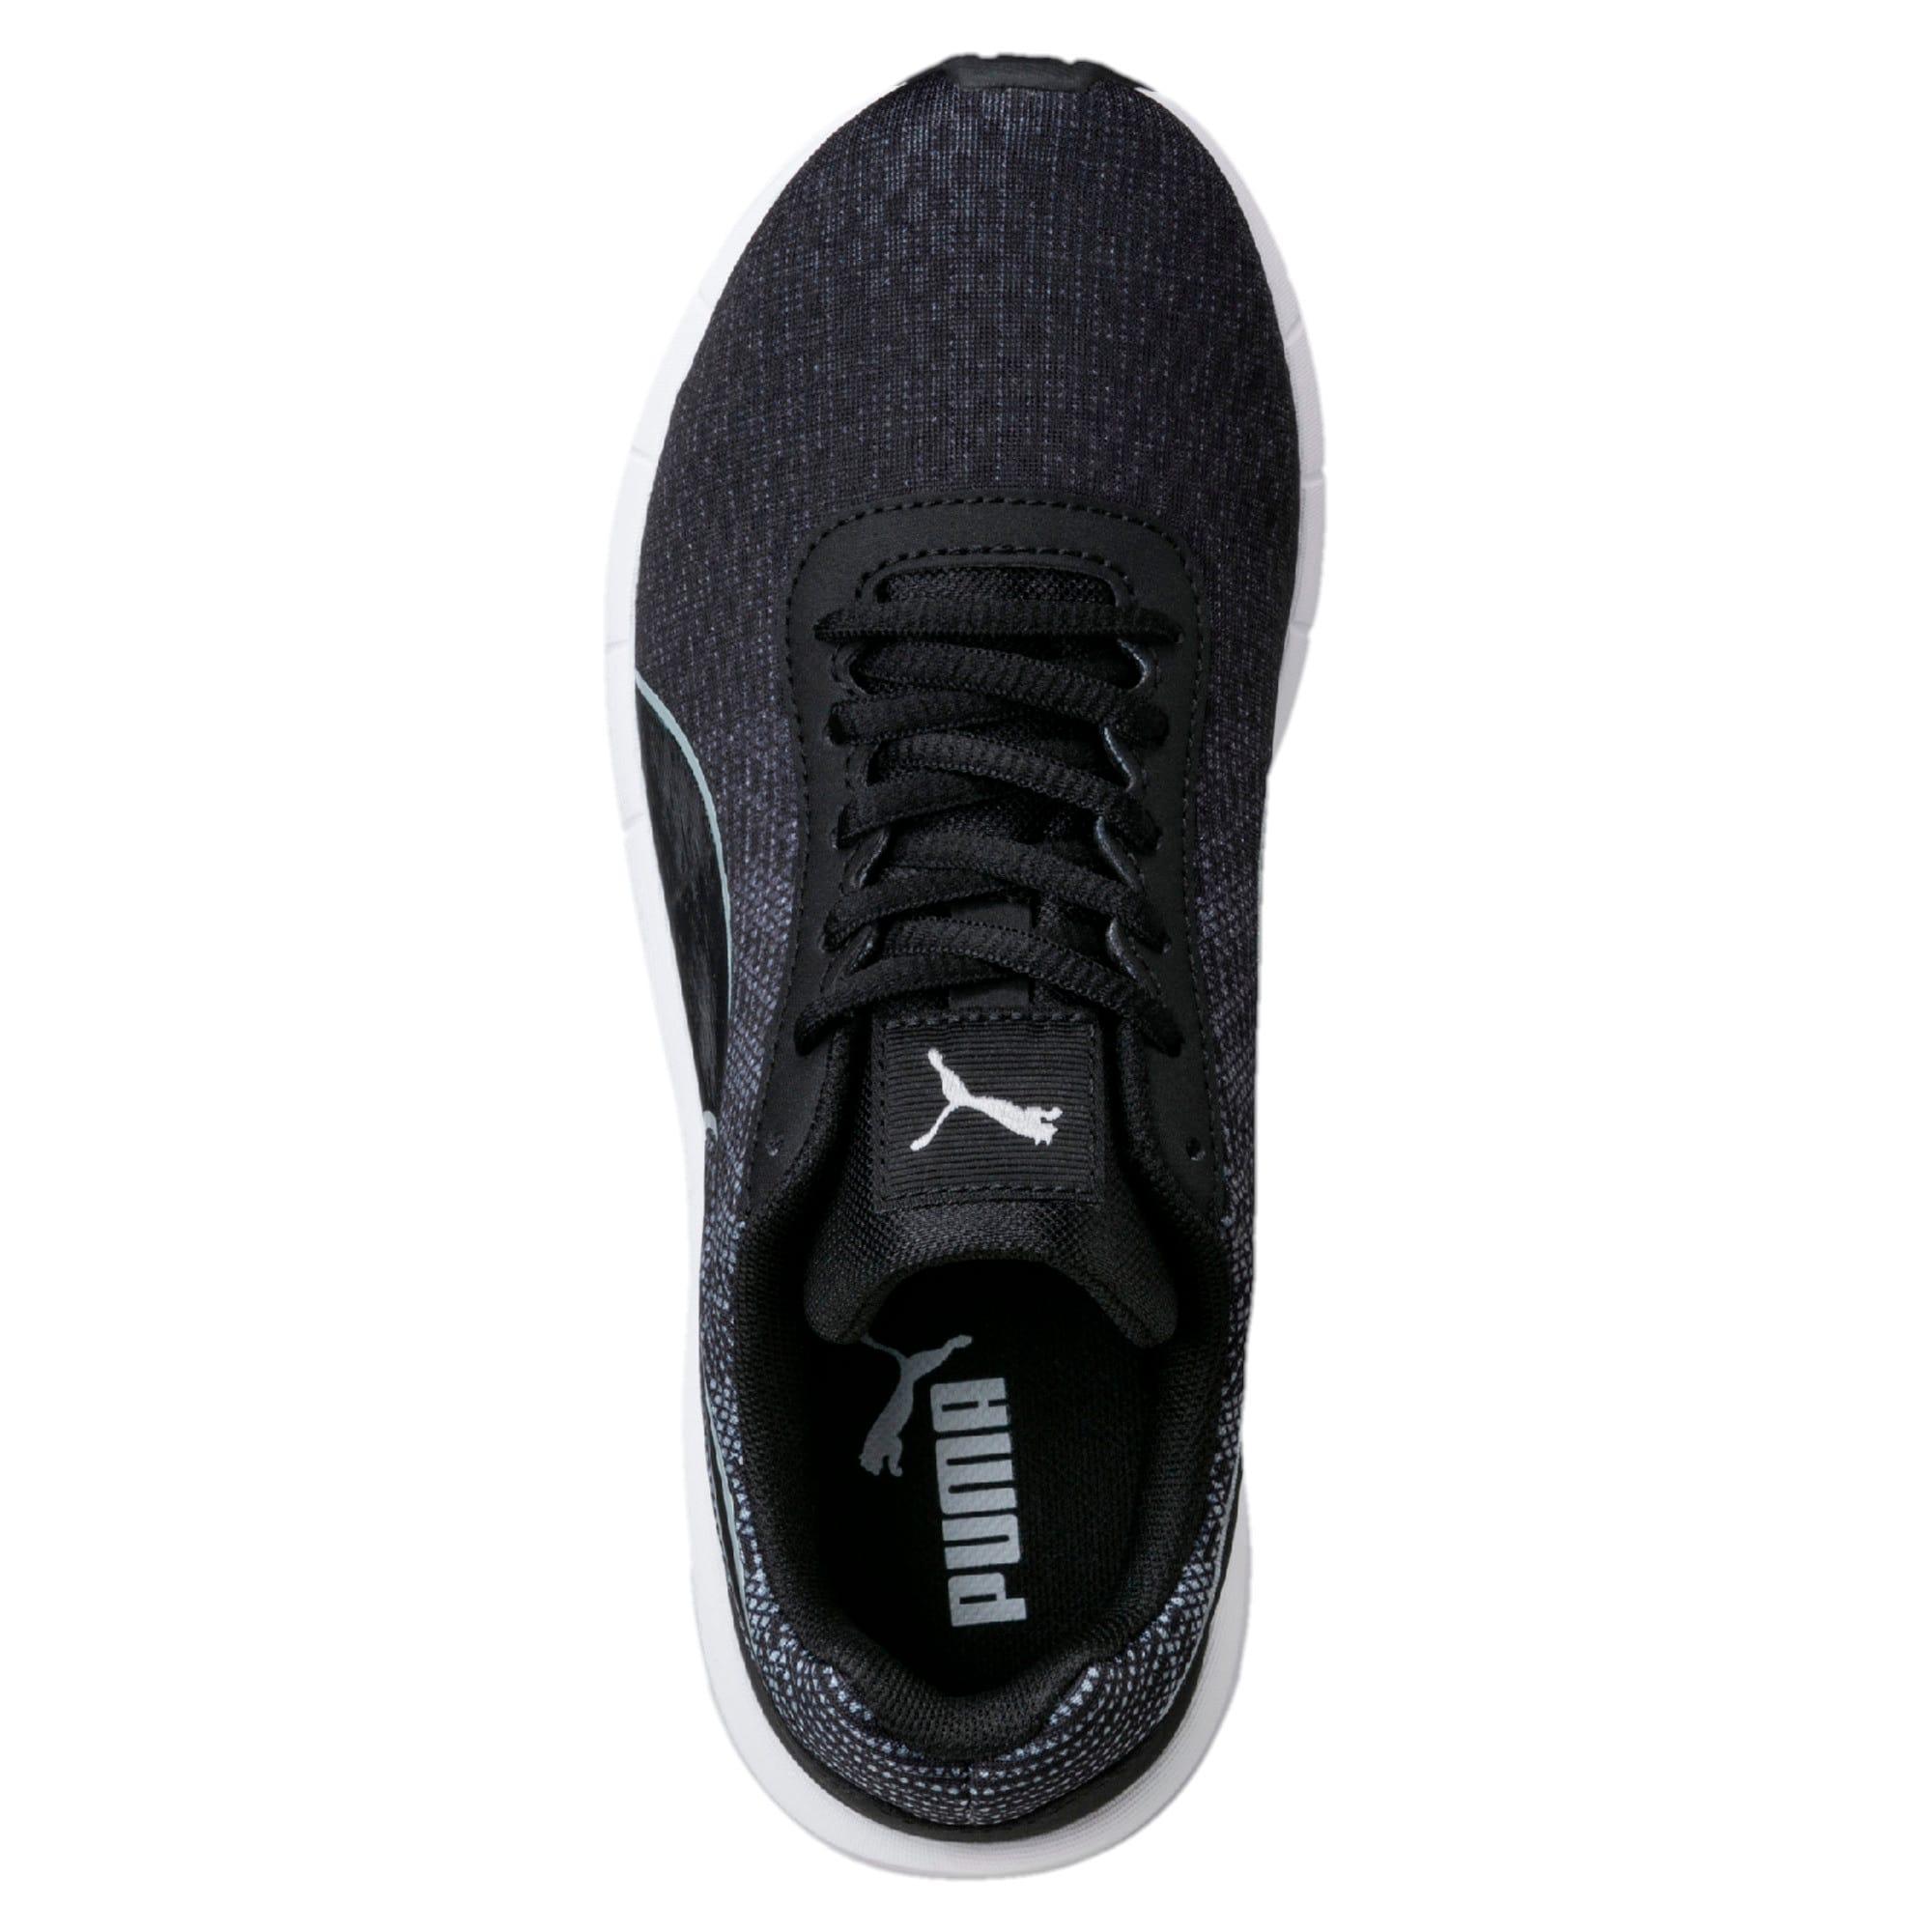 Thumbnail 4 of Comet Kids' Running Shoes, Quarry-Puma Black, medium-IND